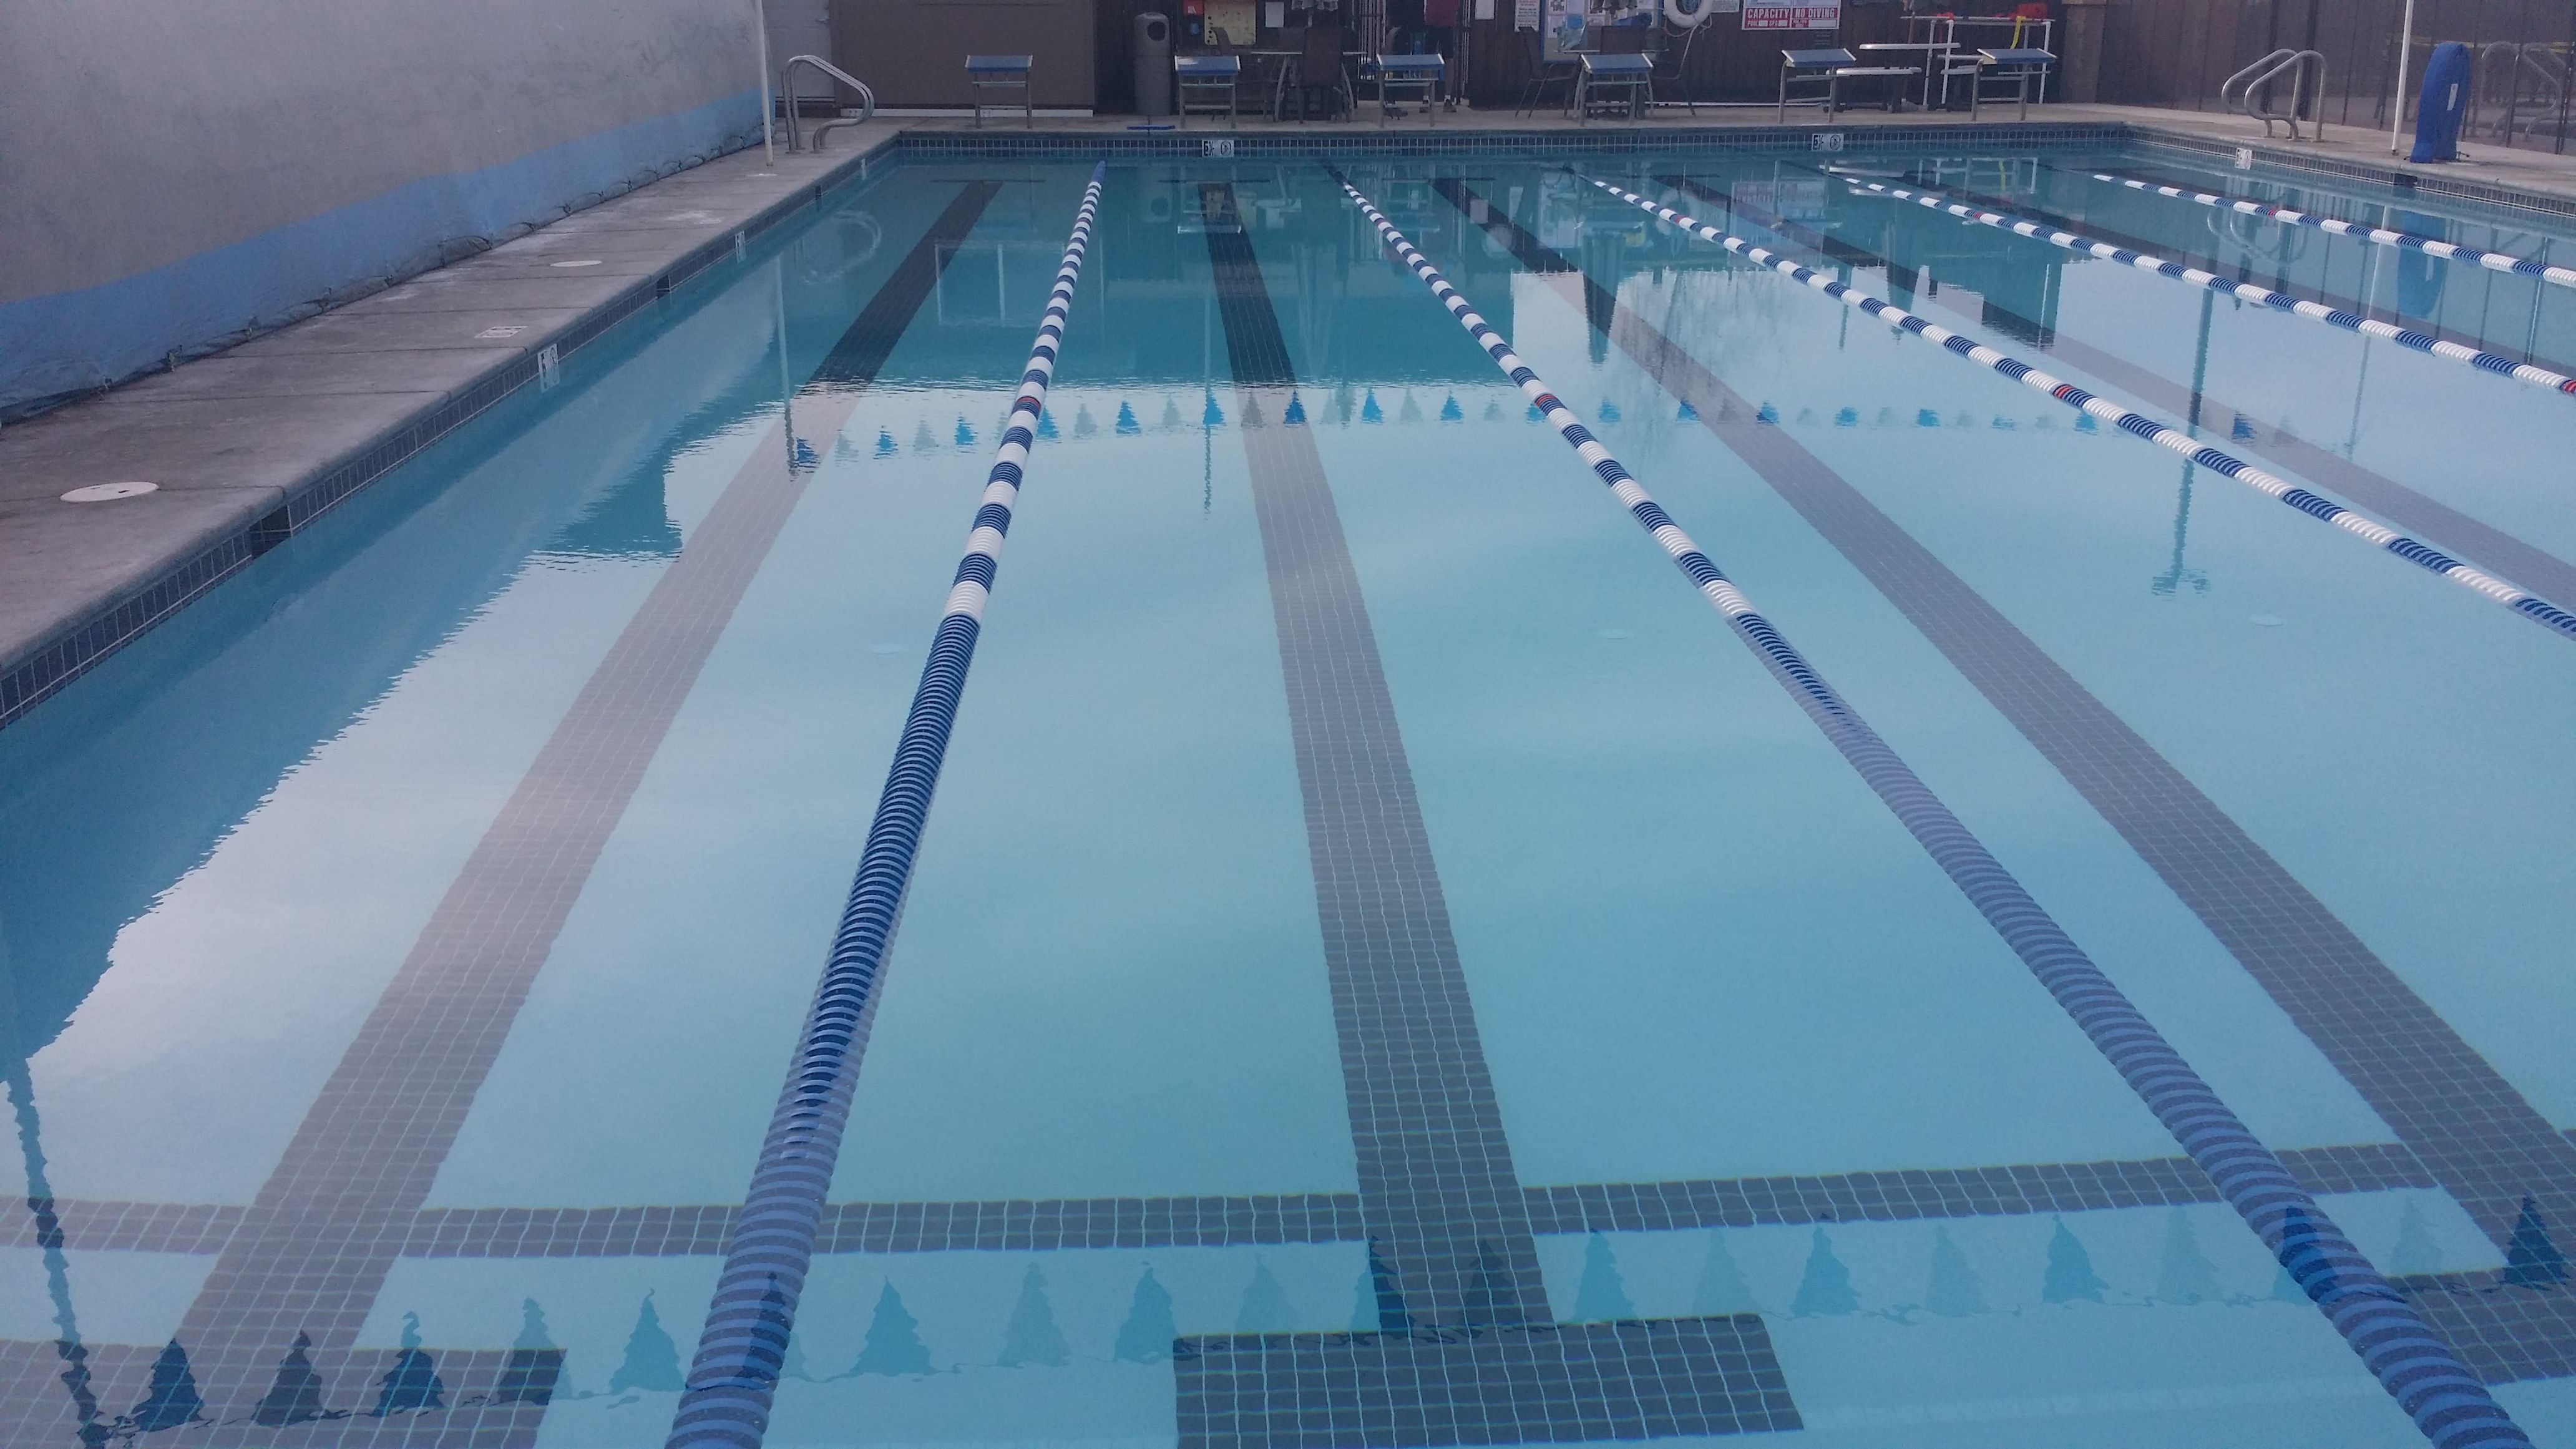 Commercial Pool Replaster Sacramento Ca Pool Plaster Pool Replastering Pool